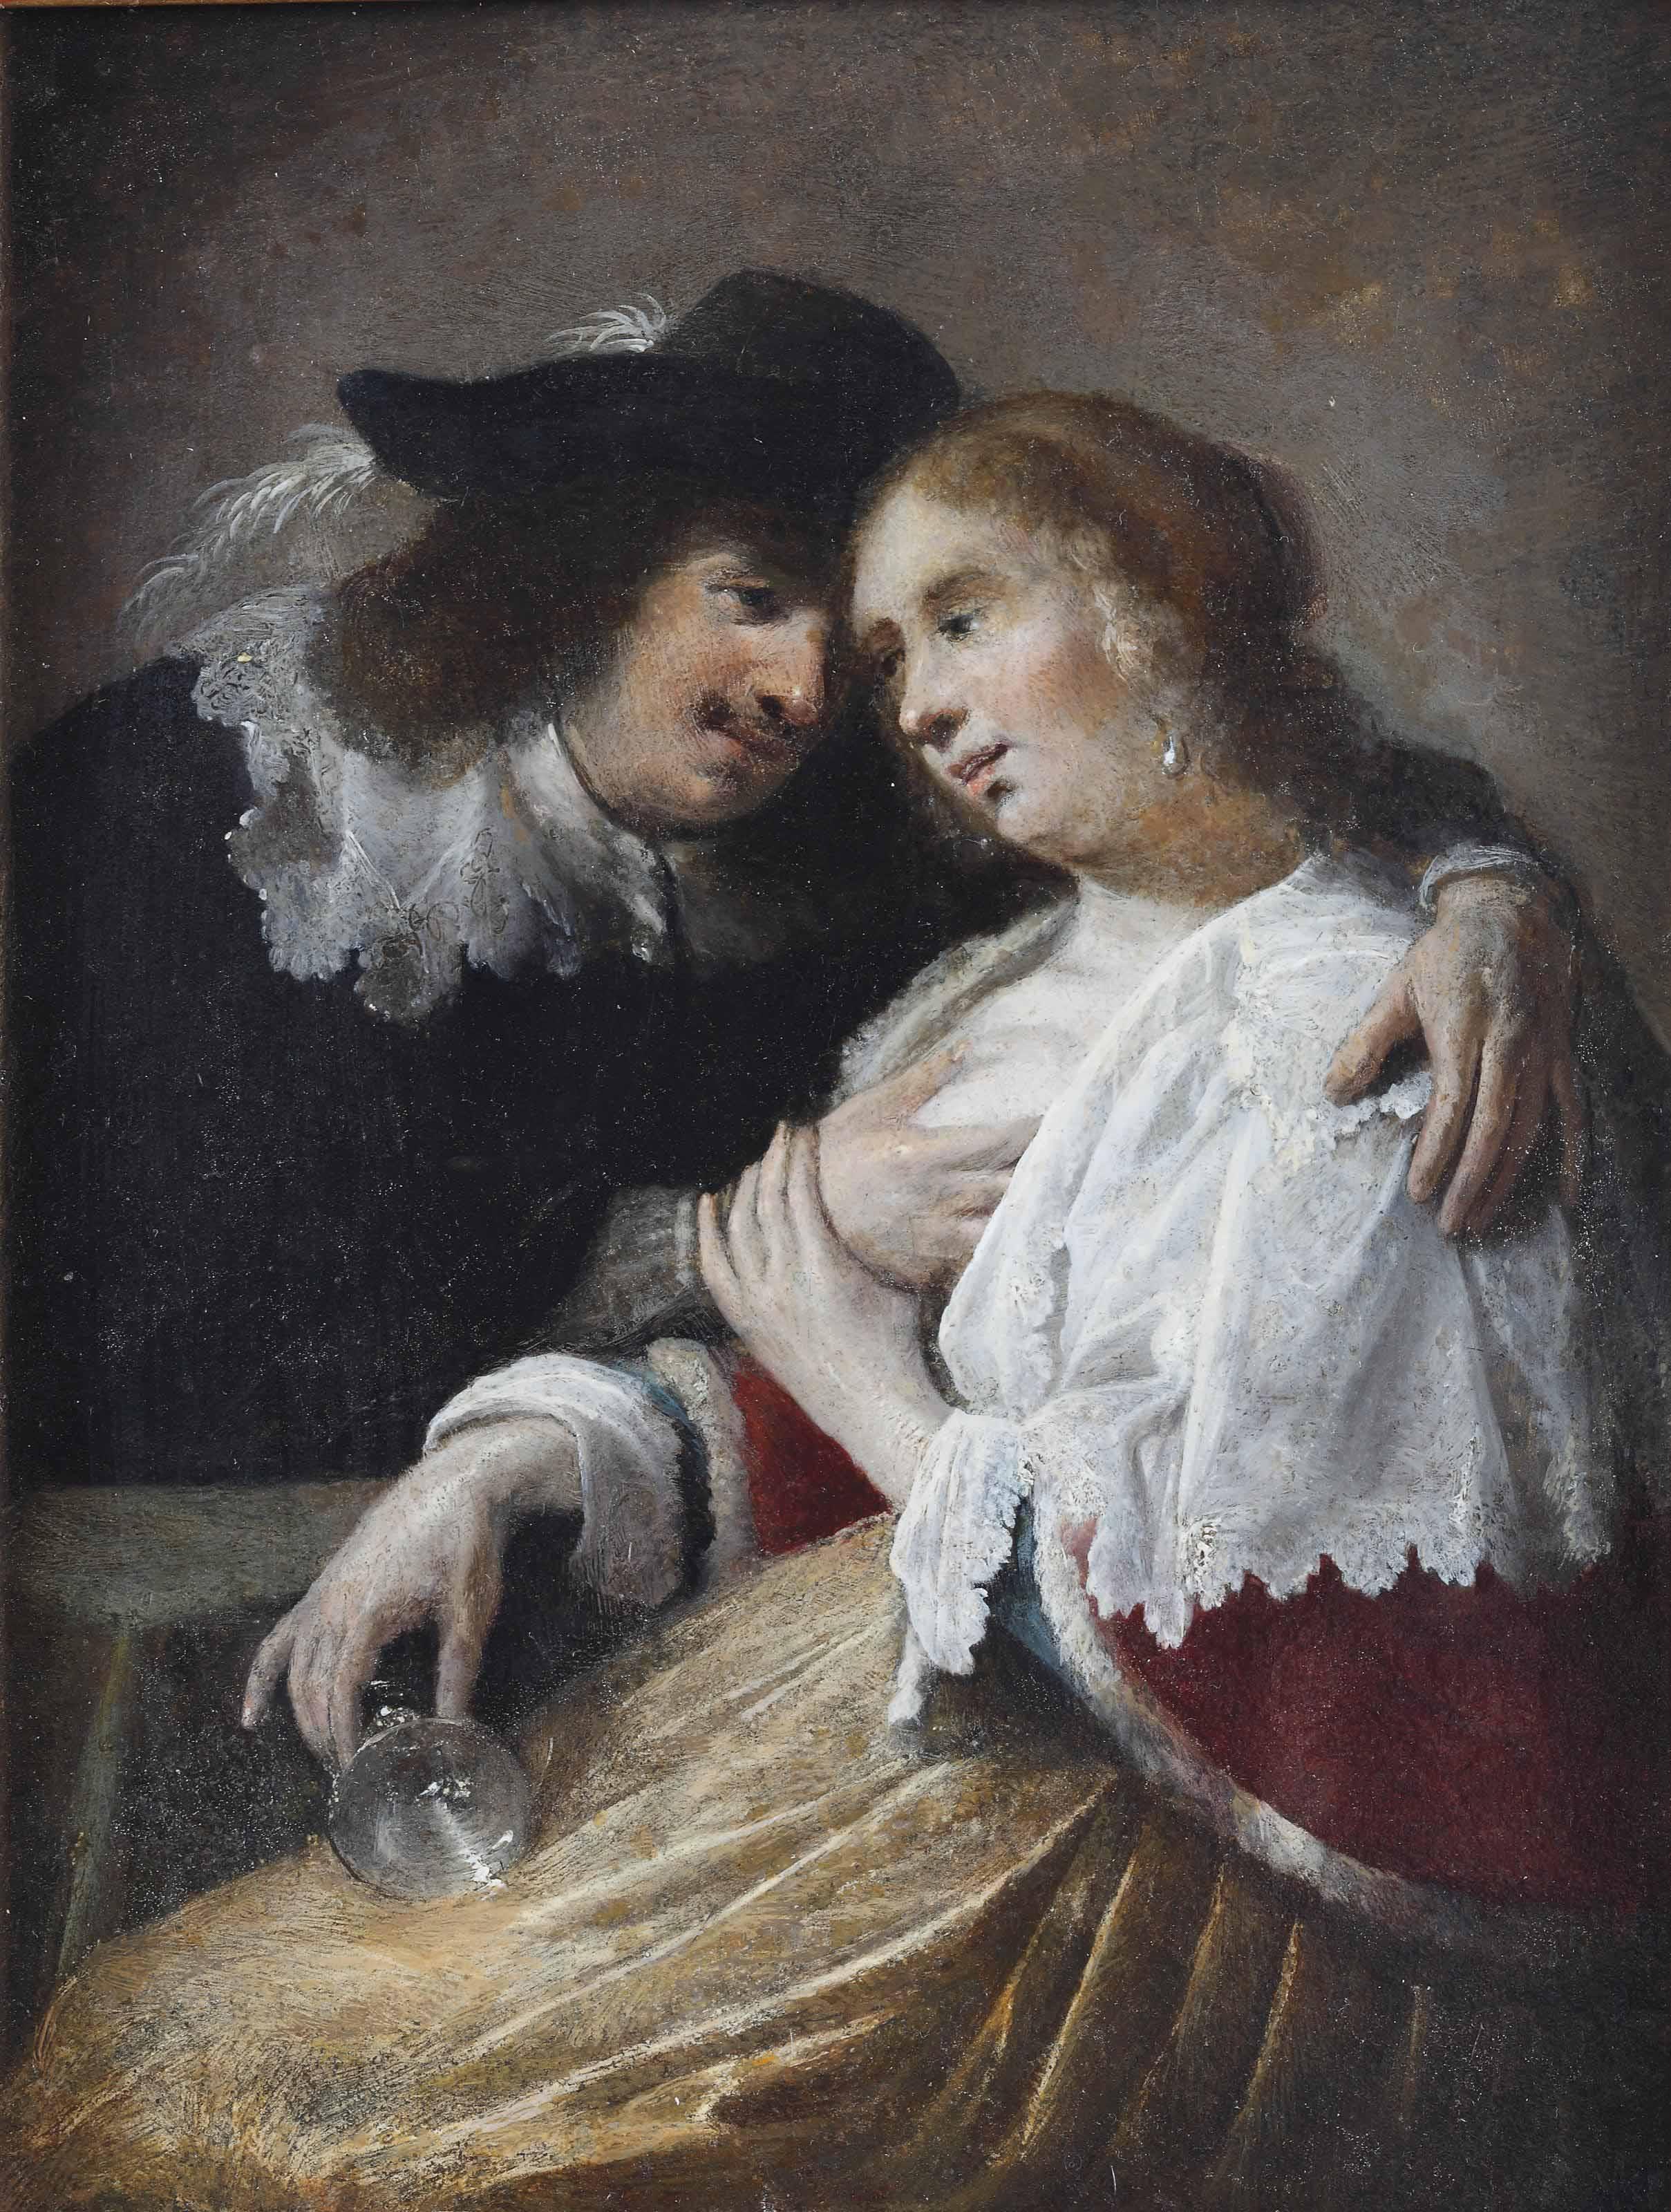 The Effects of Intemperance; a man embracing a drunken woman